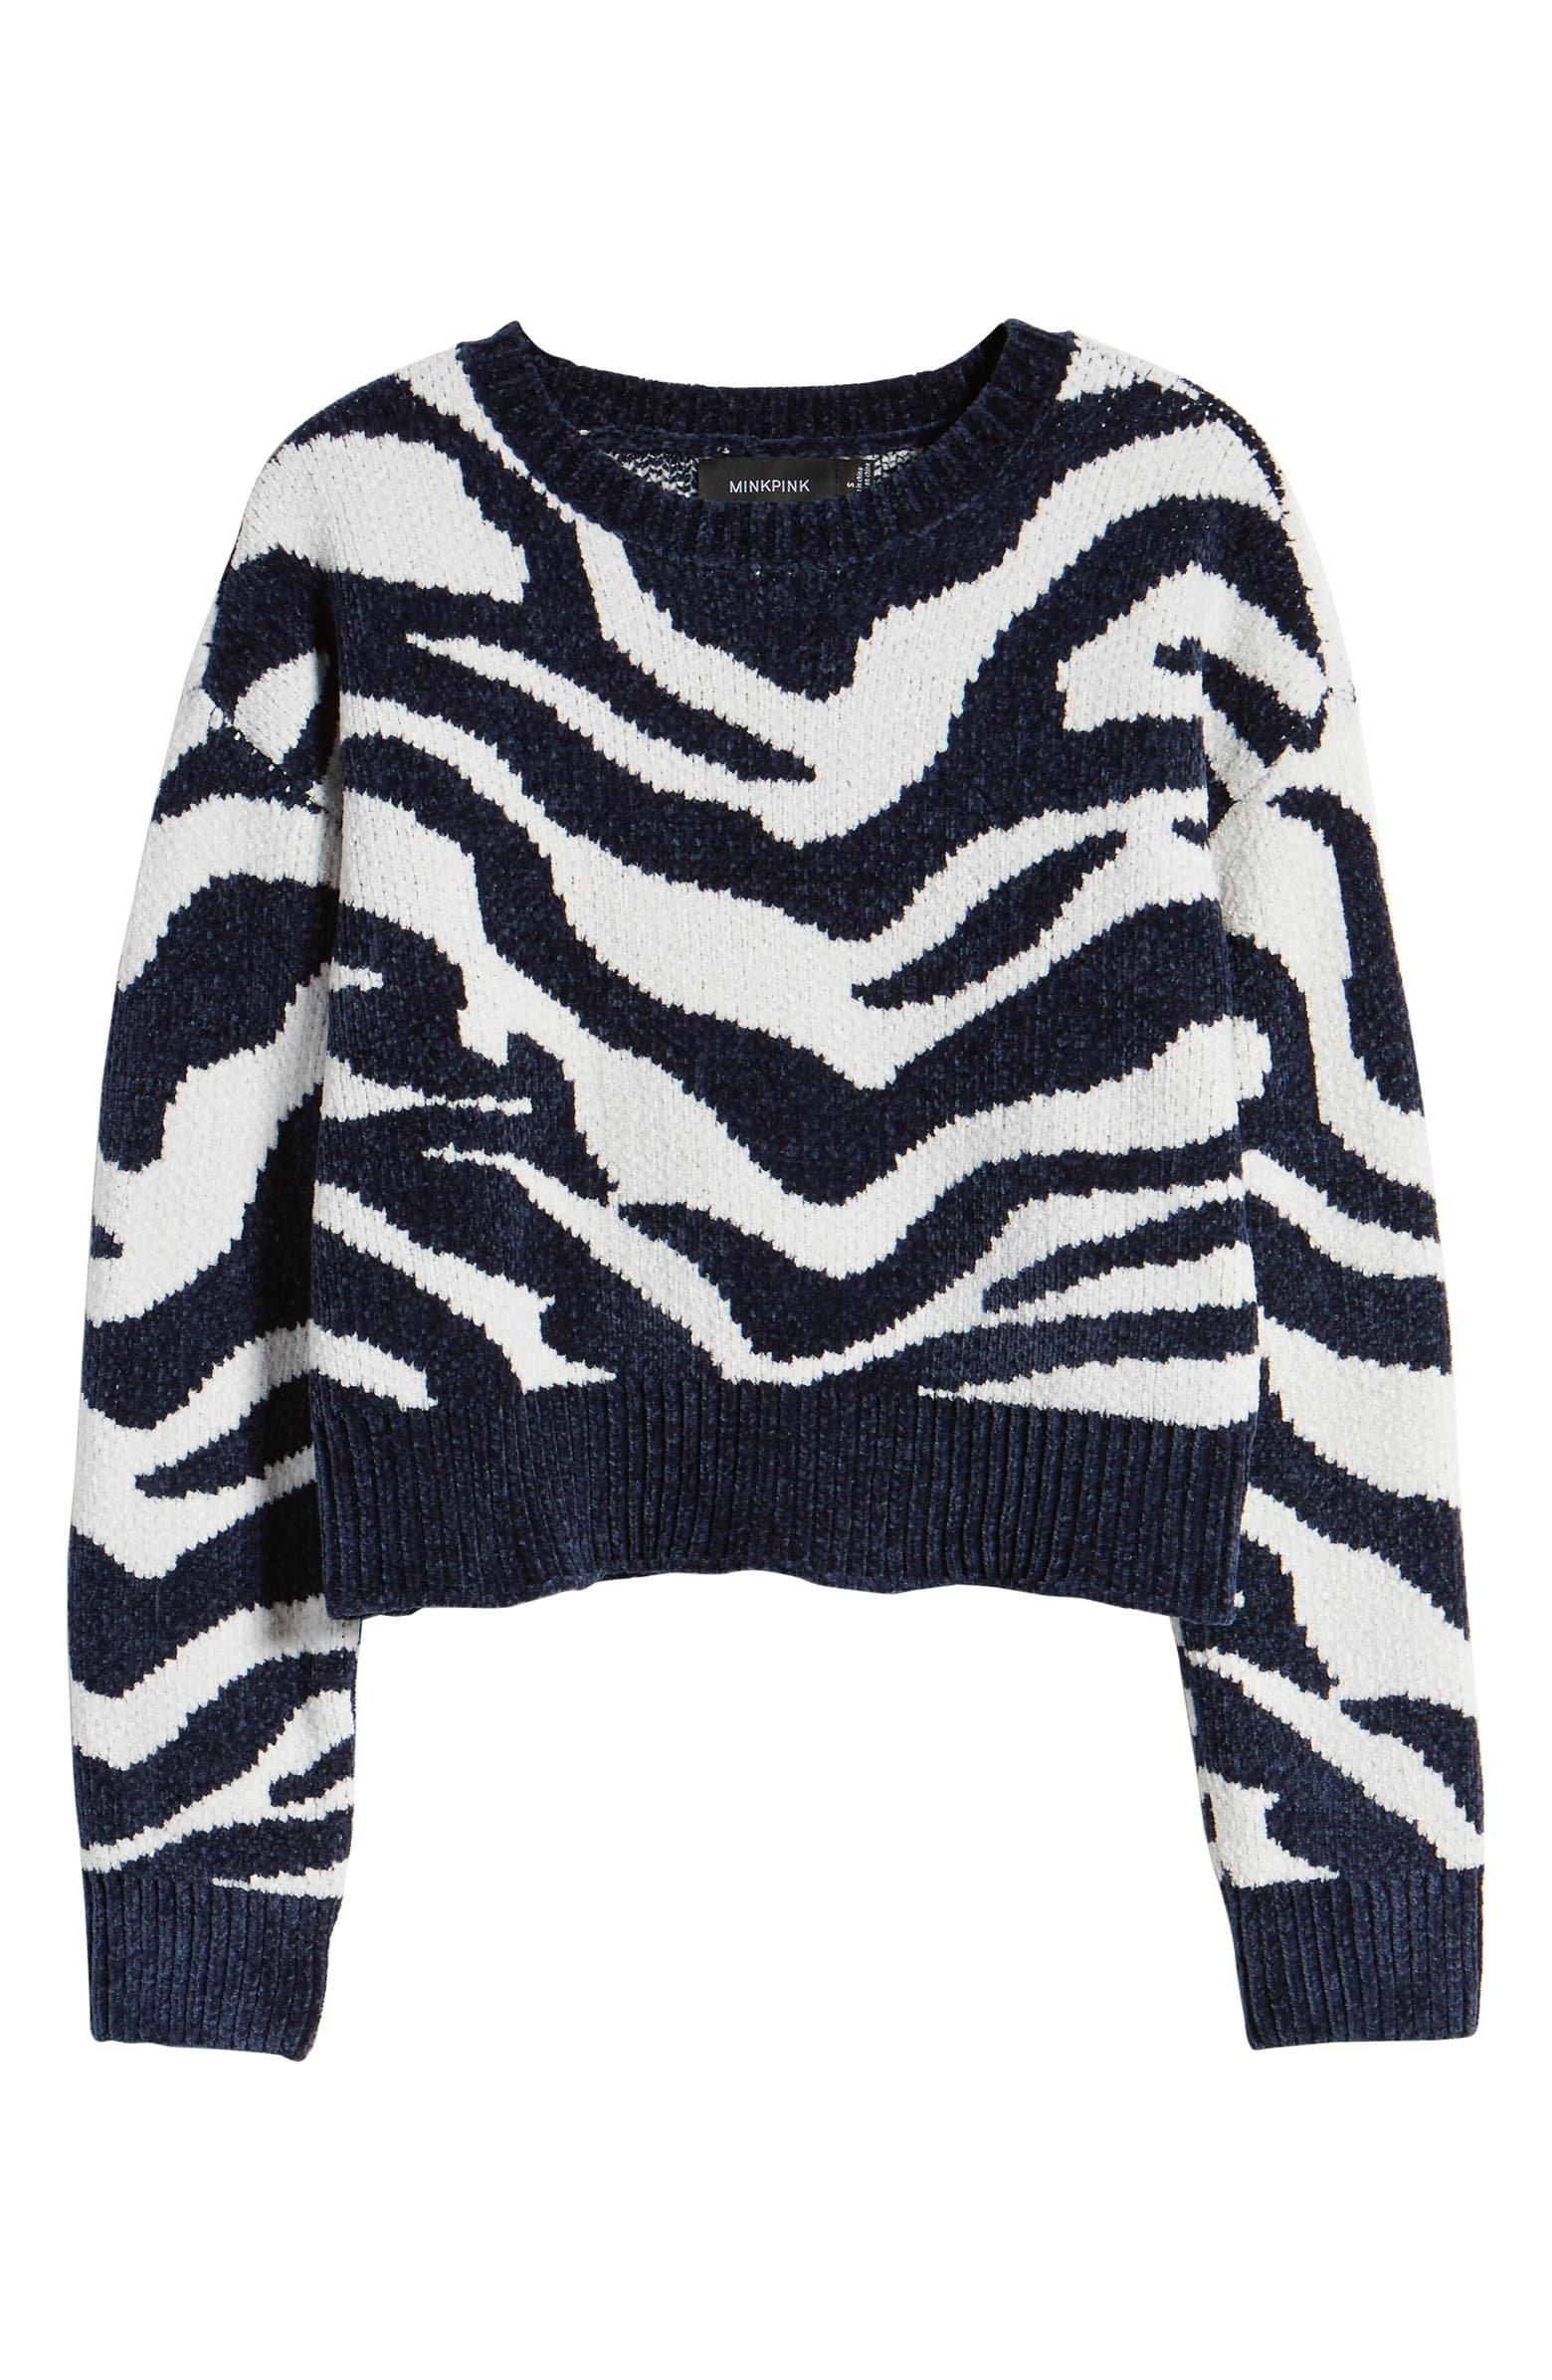 MINKPINK A Wild Winter Chenille Sweater   Nordstrom